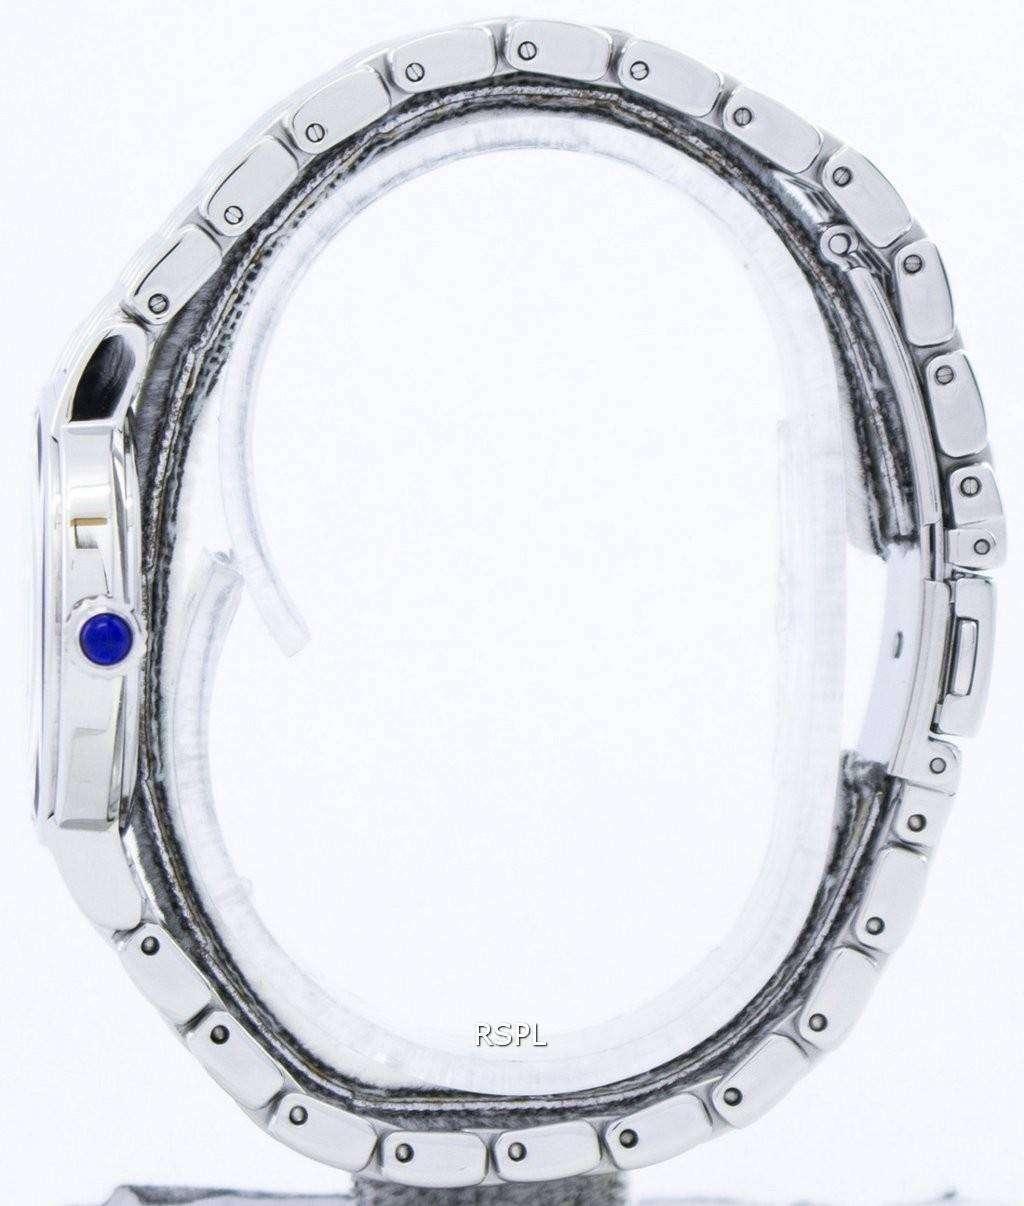 Seiko Quartz Swarovski Crystals SFQ805 SFQ805P1 SFQ805P Women's Watch